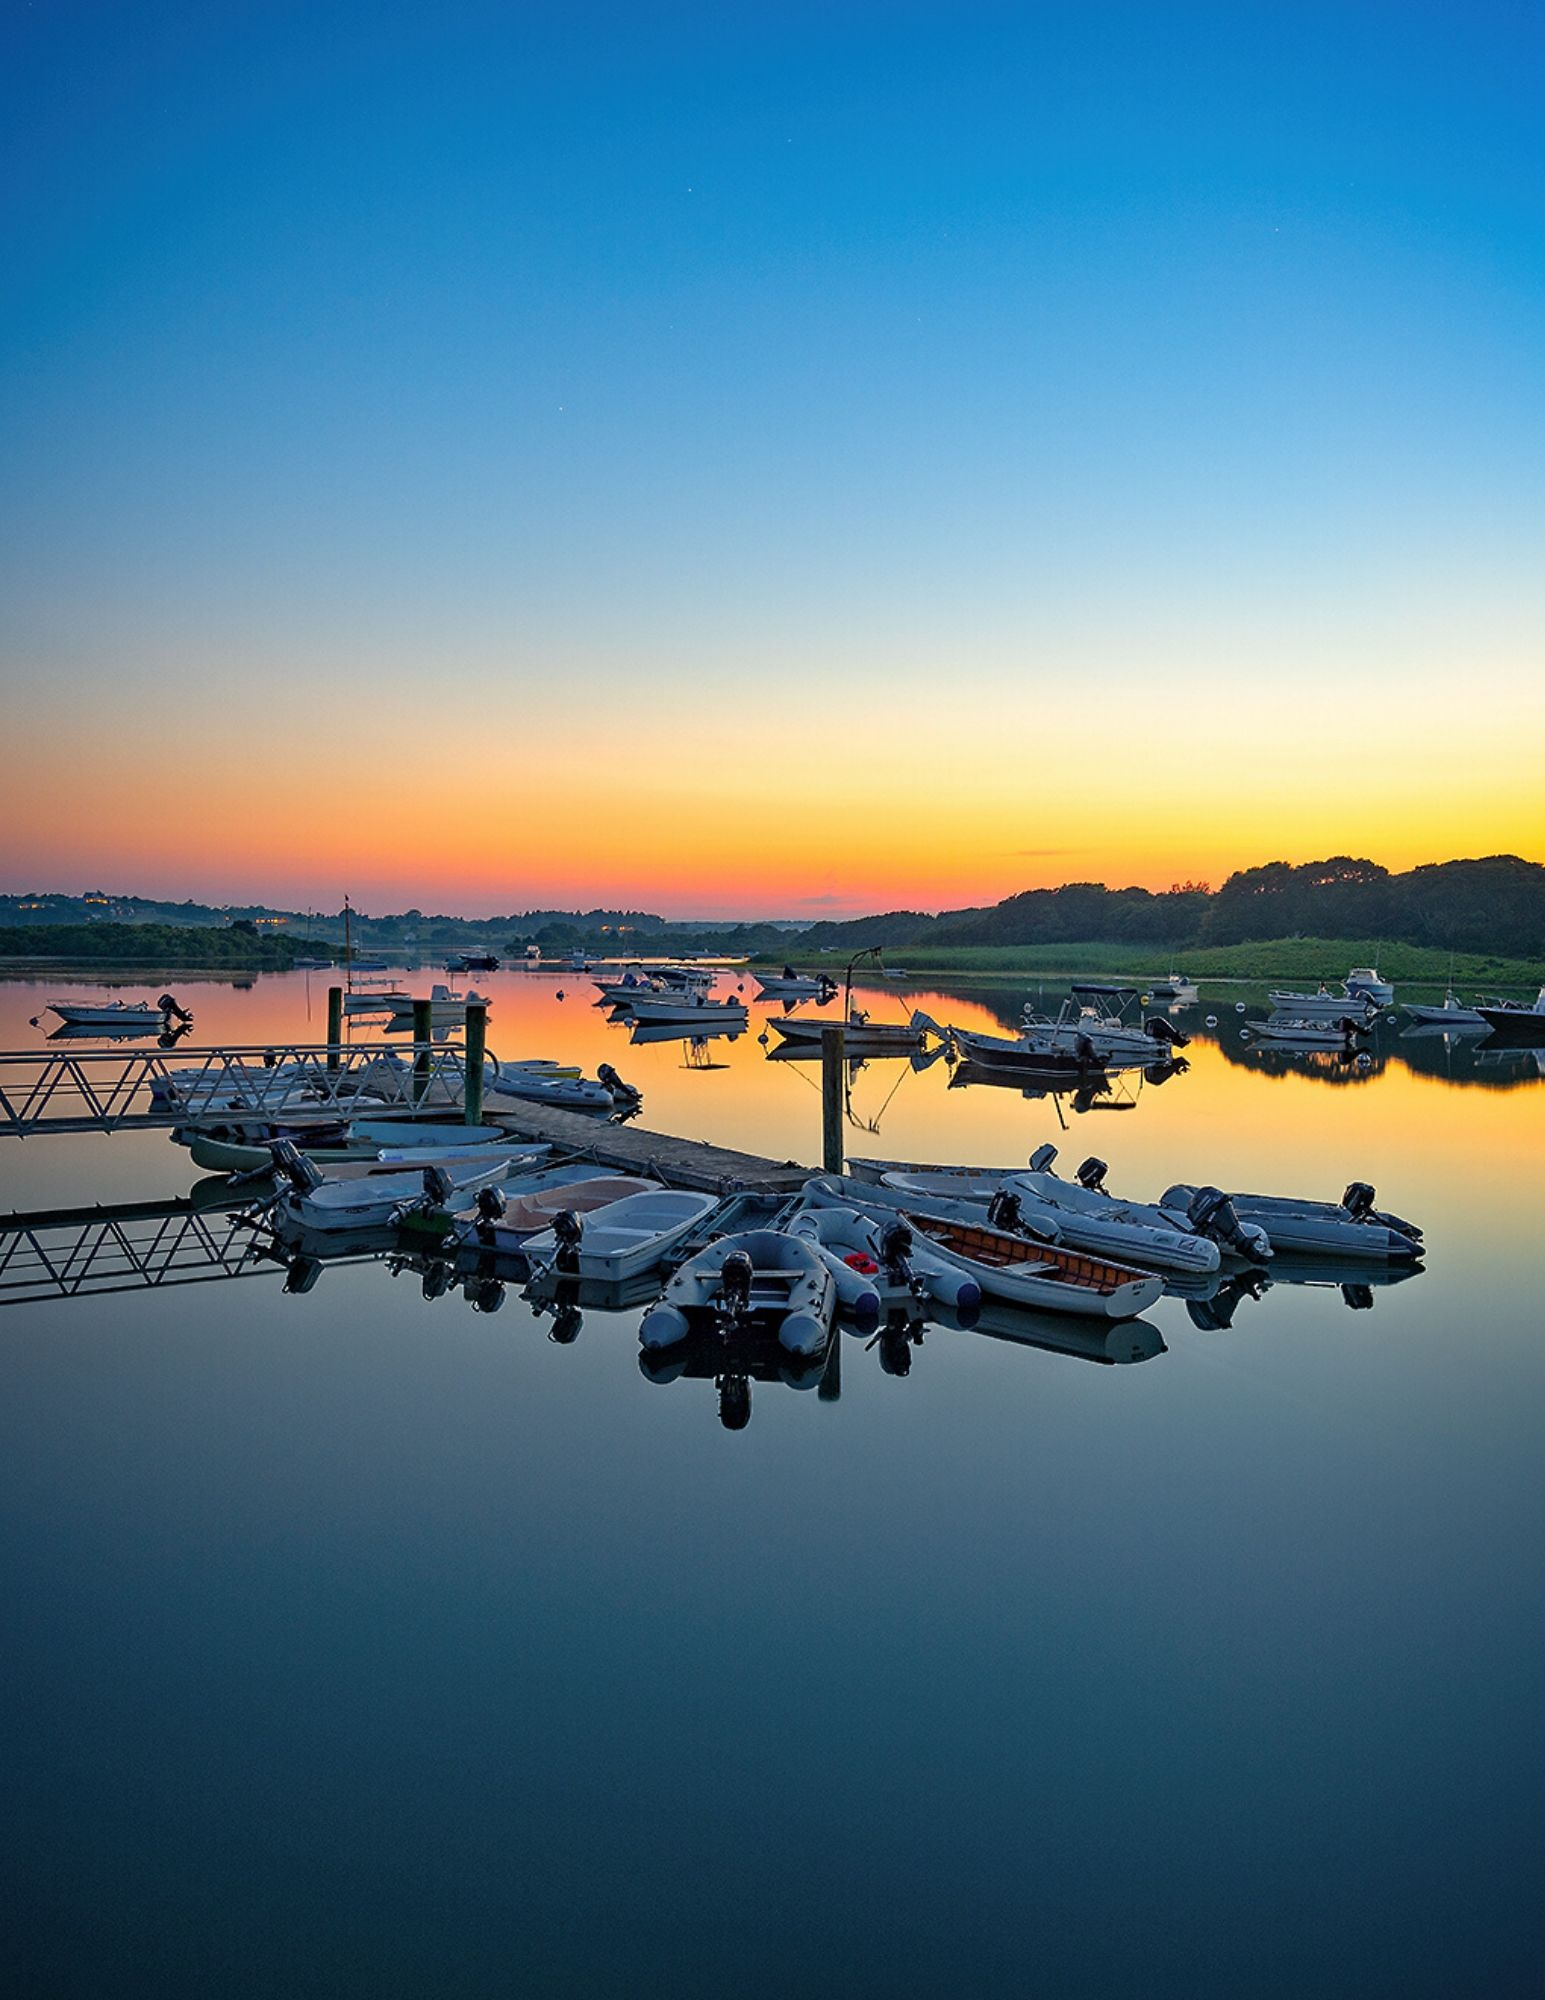 John Montes Jr Photography Best Places to Photograph Sunrise and Sunset on Marthas Vineyard-Best Places to Photograph Sunrise and Sunset on Marthas Vineyard-12